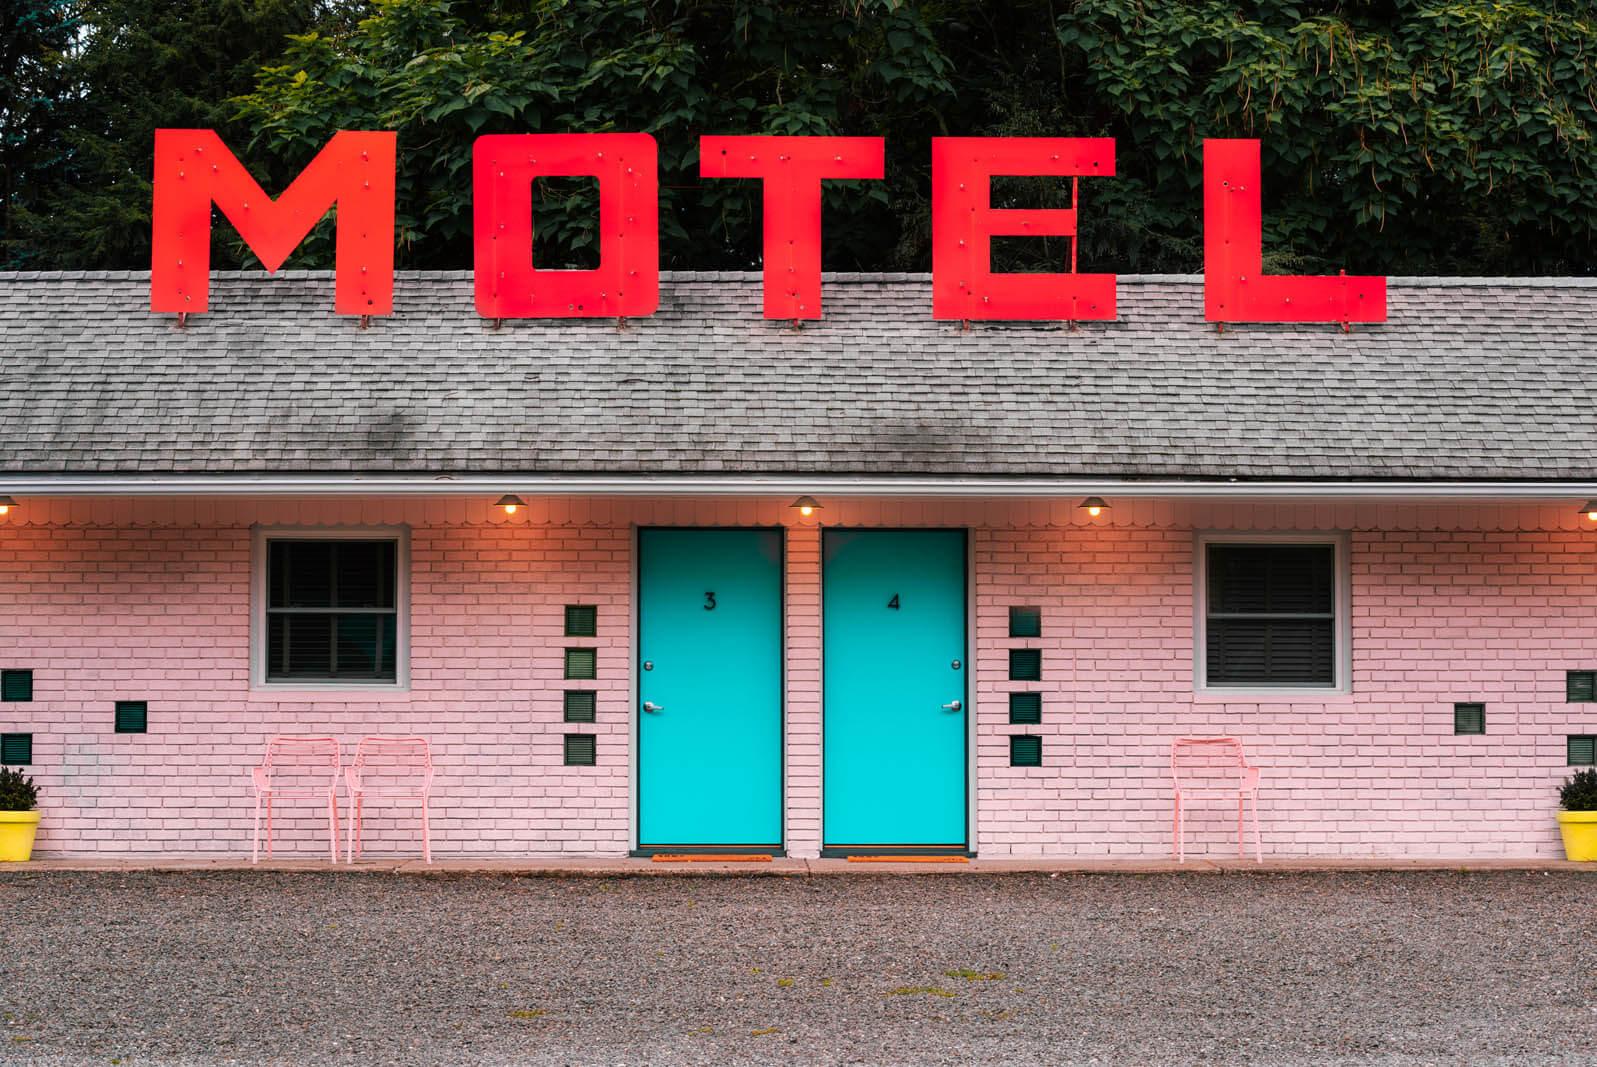 Starlite Motel in Kerhonkson New York in the Catskills